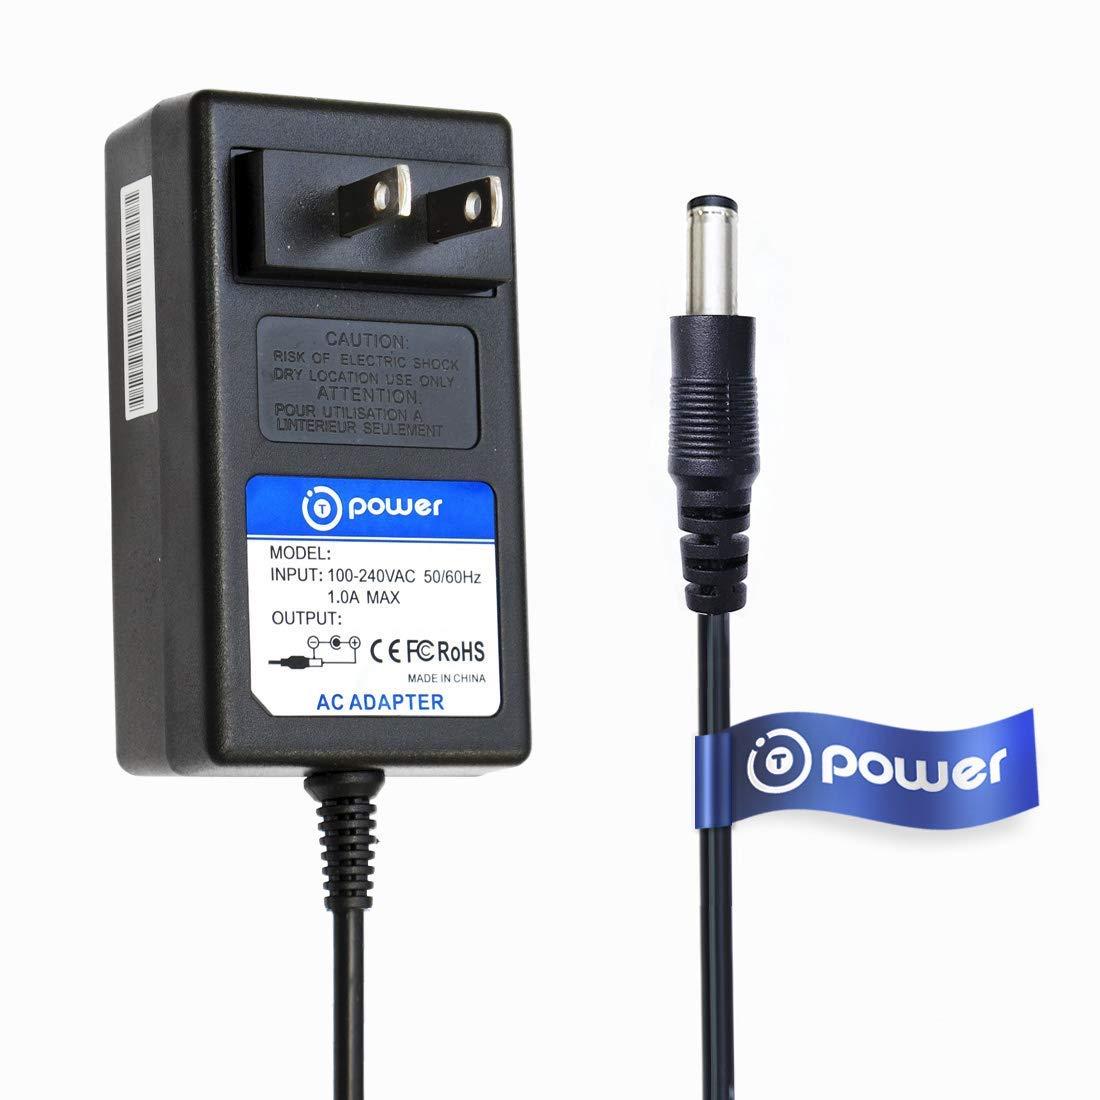 T POWER (24v) Ac Dc Adapter Charger for IK Multimedia iLoud Micro Monitors ultra-compact studio desktop Speaker / IP-ILOUD-MM-IN , IPILOUDMMIN Power Supply